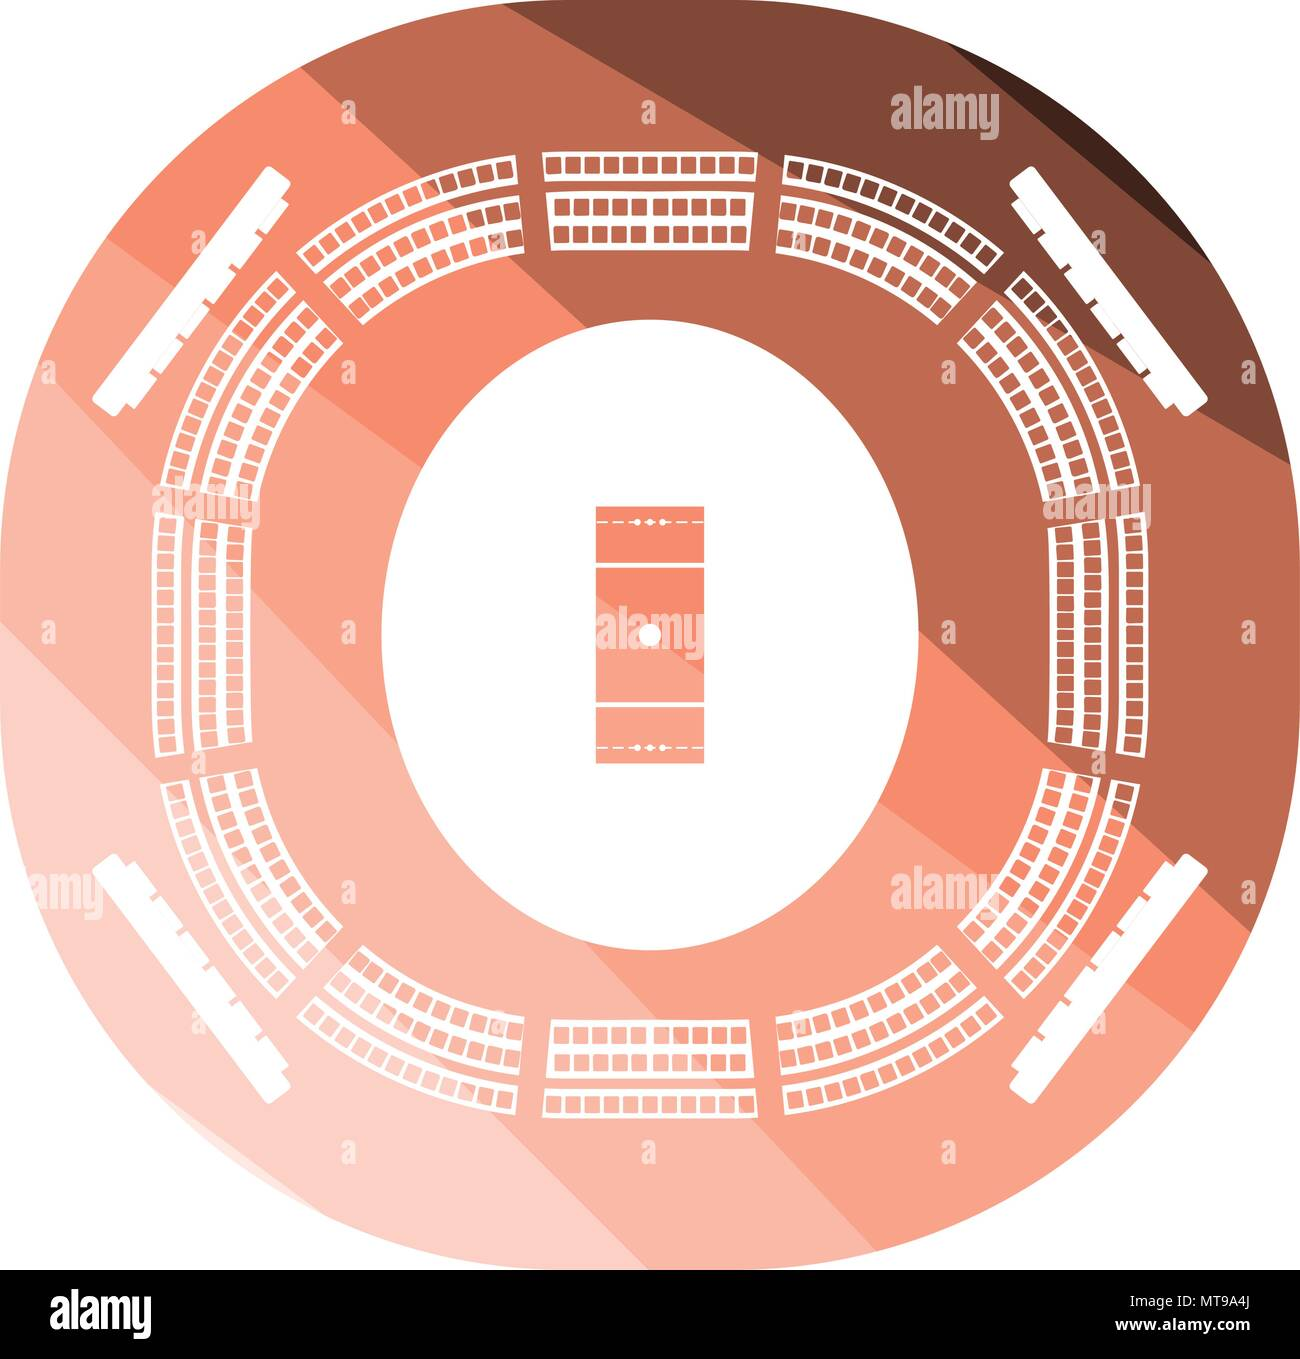 hight resolution of cricket stadium icon flat color design vector illustration